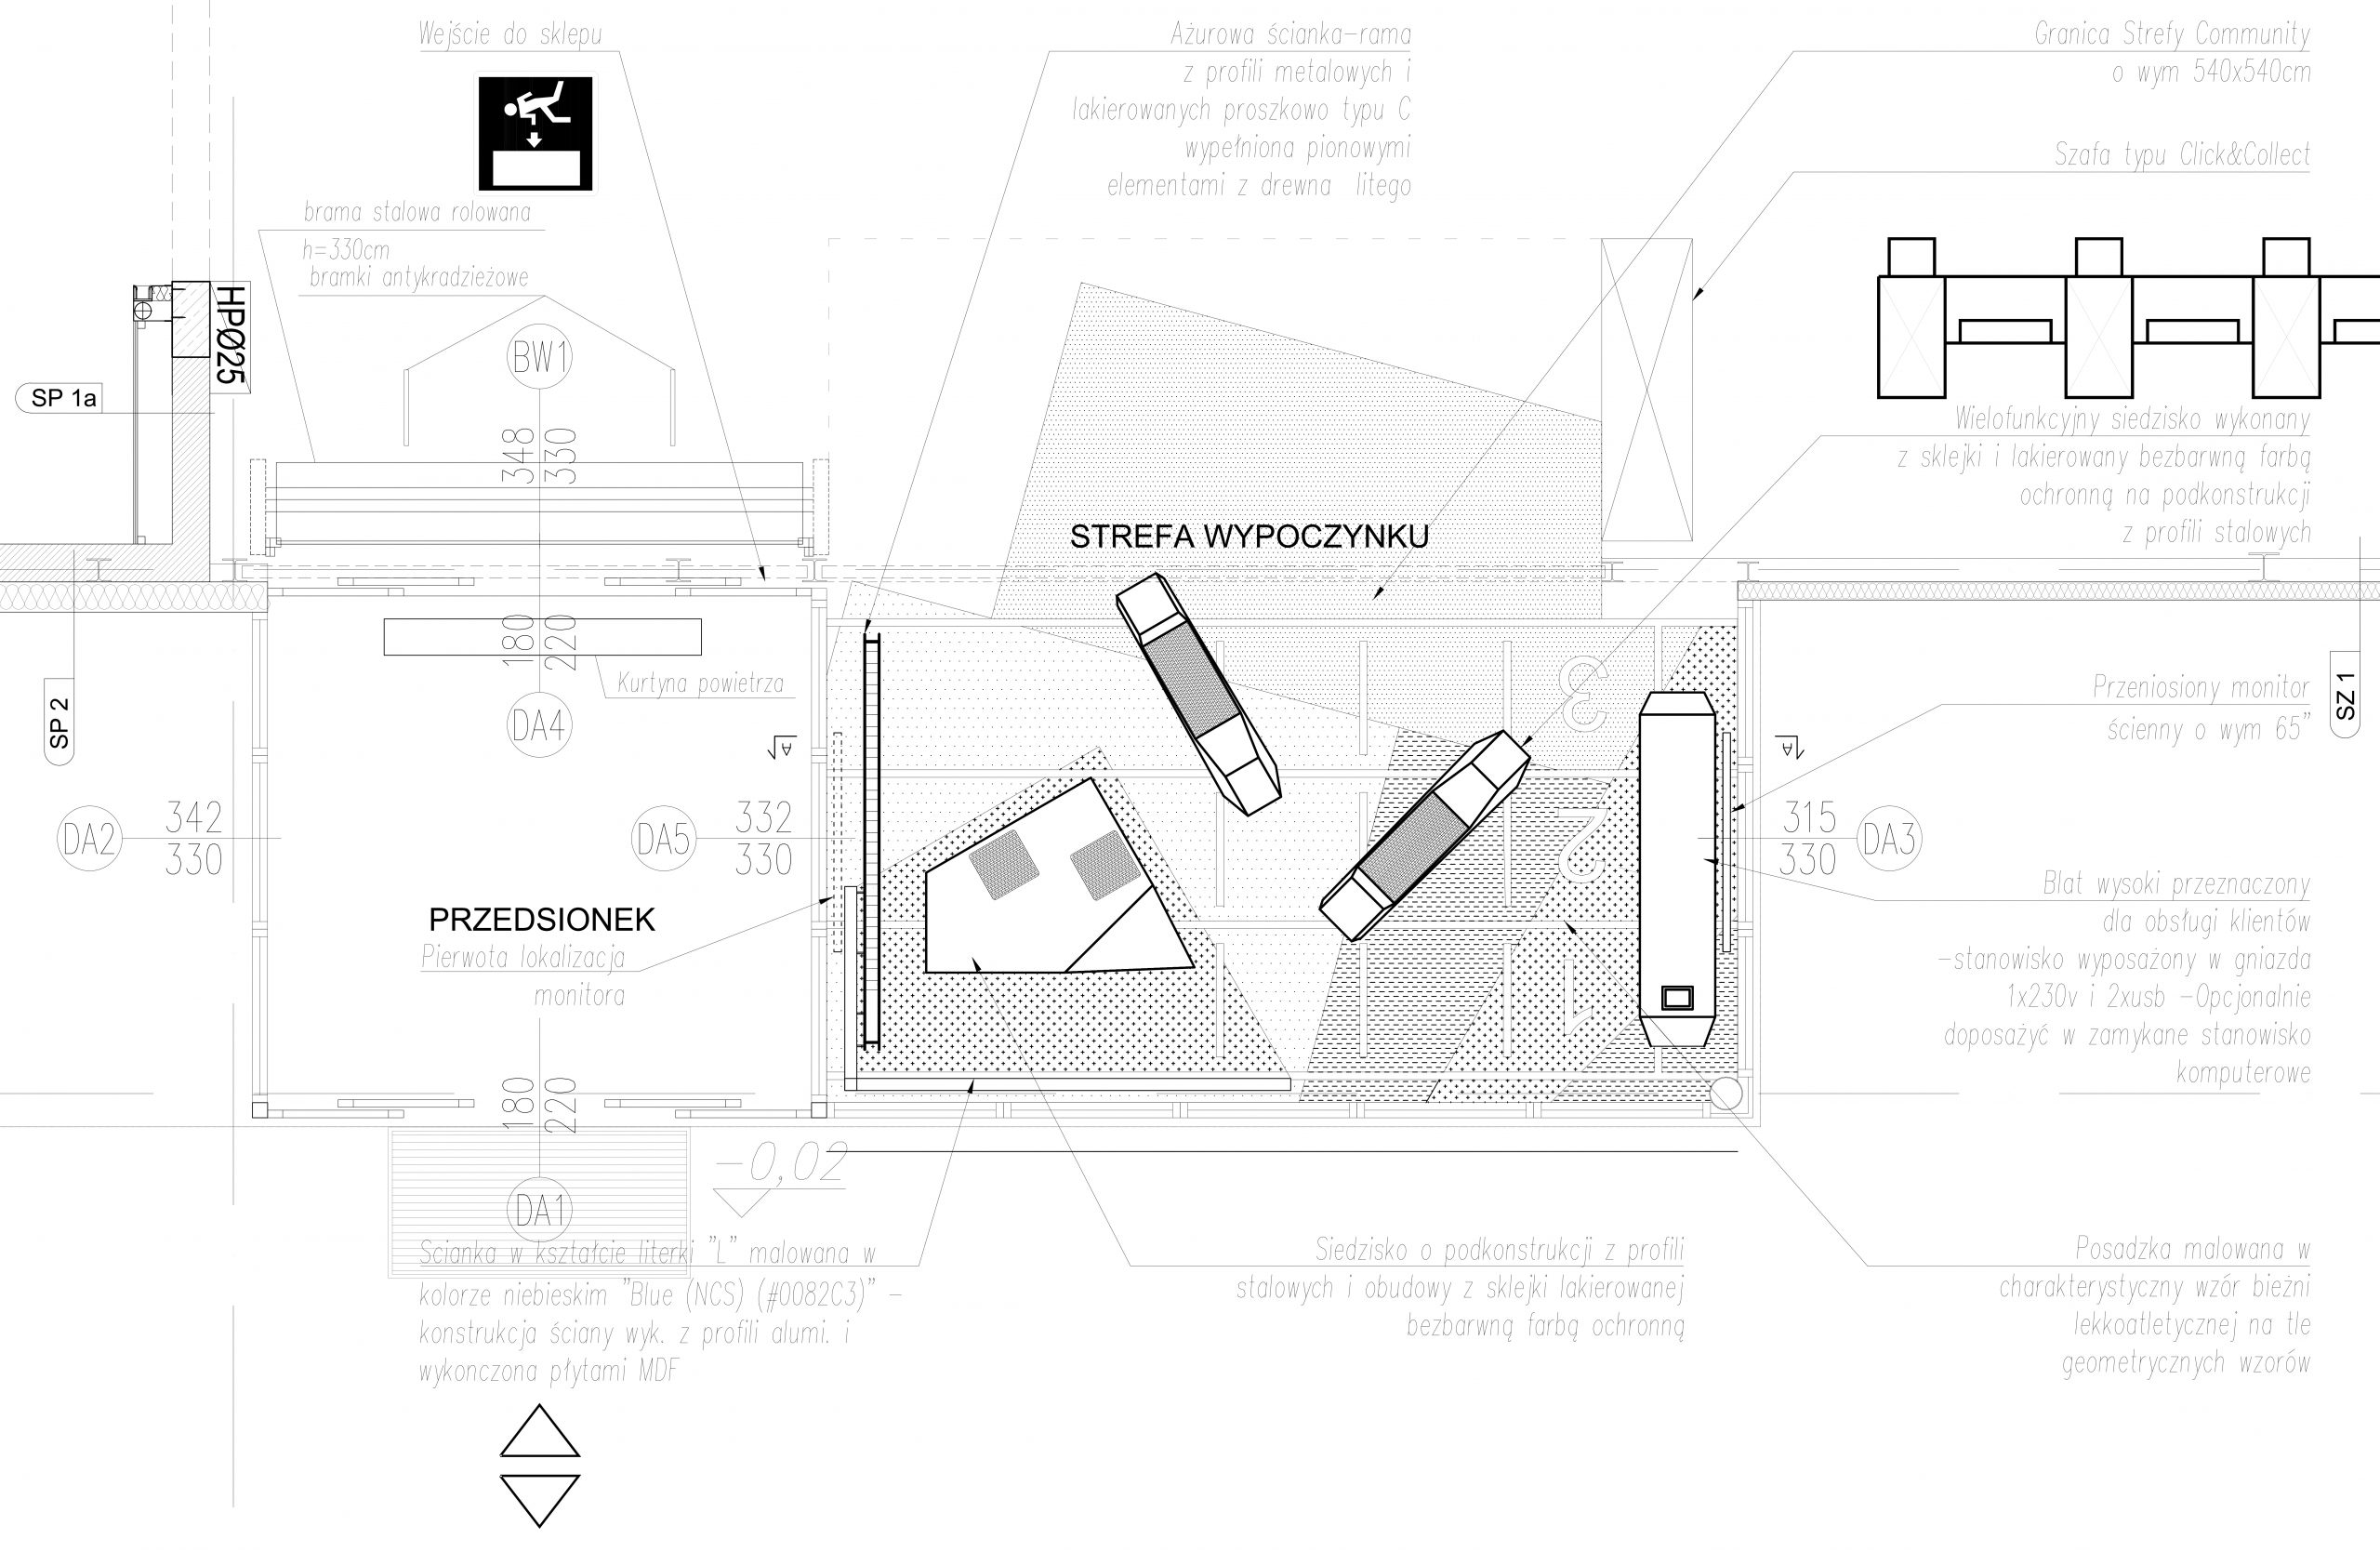 http://www.atig.pl/wp-content/uploads/2020/08/Plan-funkcjonalny-scaled.jpg